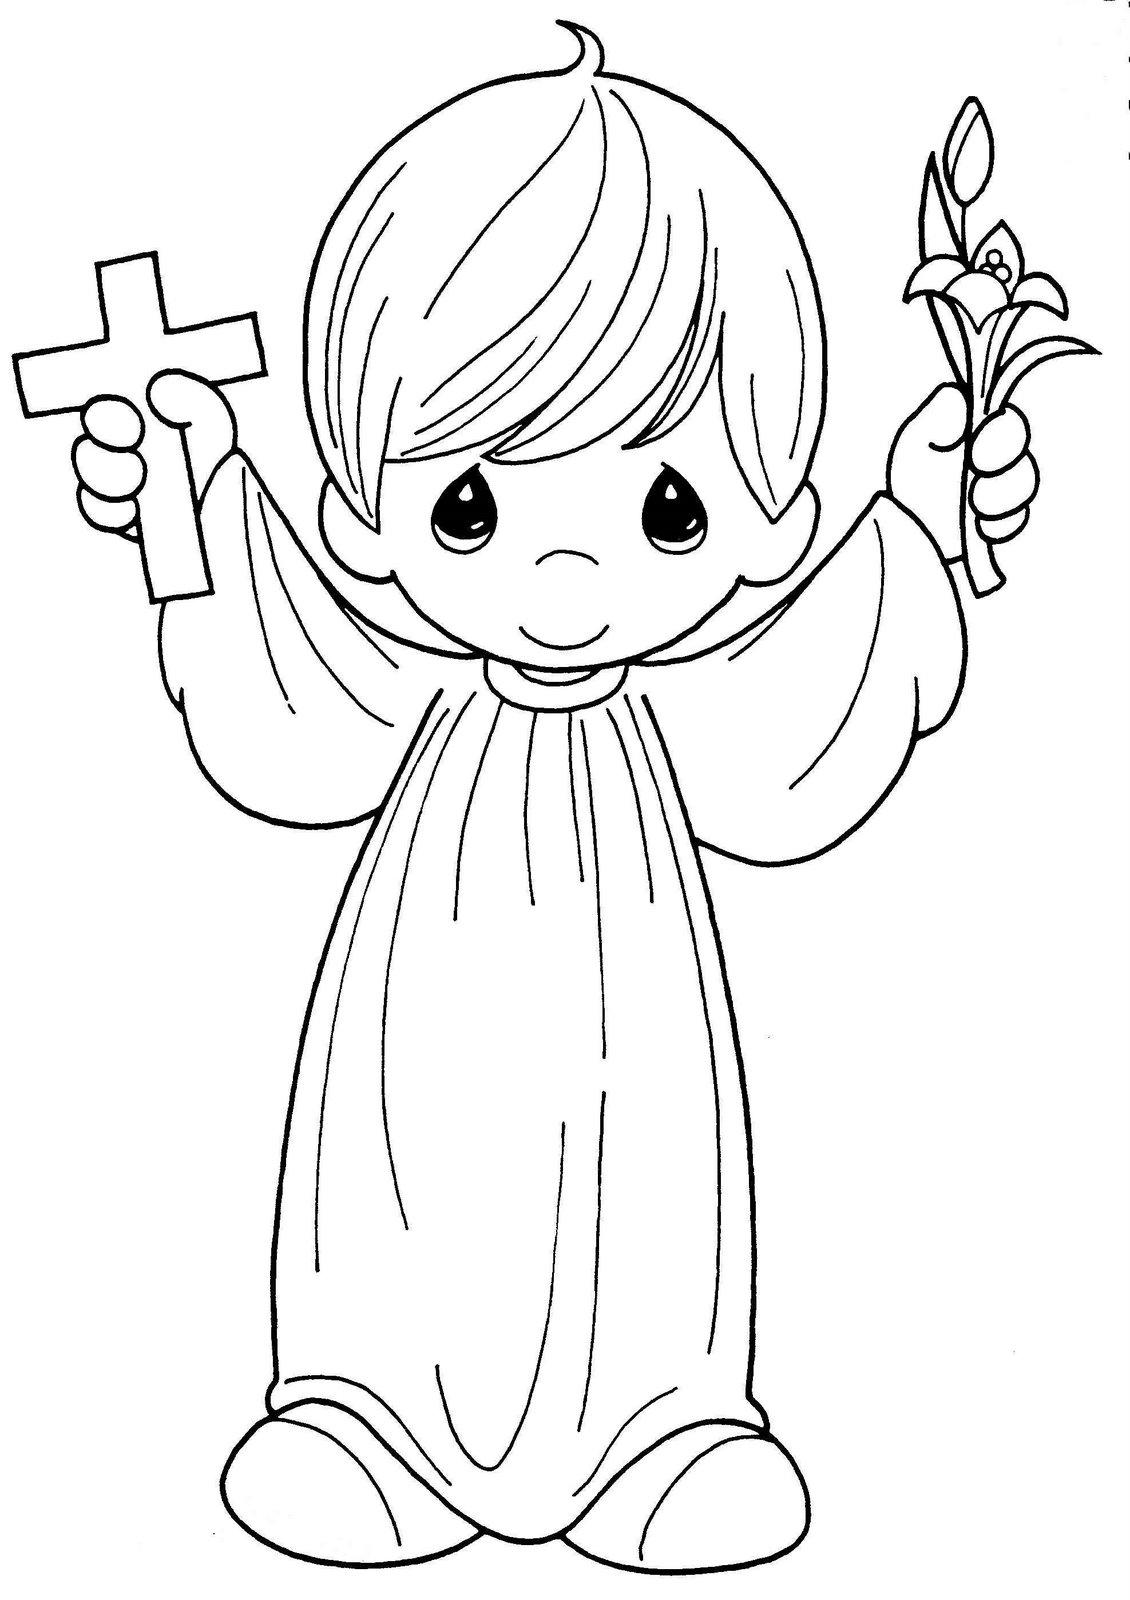 IMAGENES RELIGIOSAS PARA PINTAR Imagui - Imagenes De Religion Para Colorear